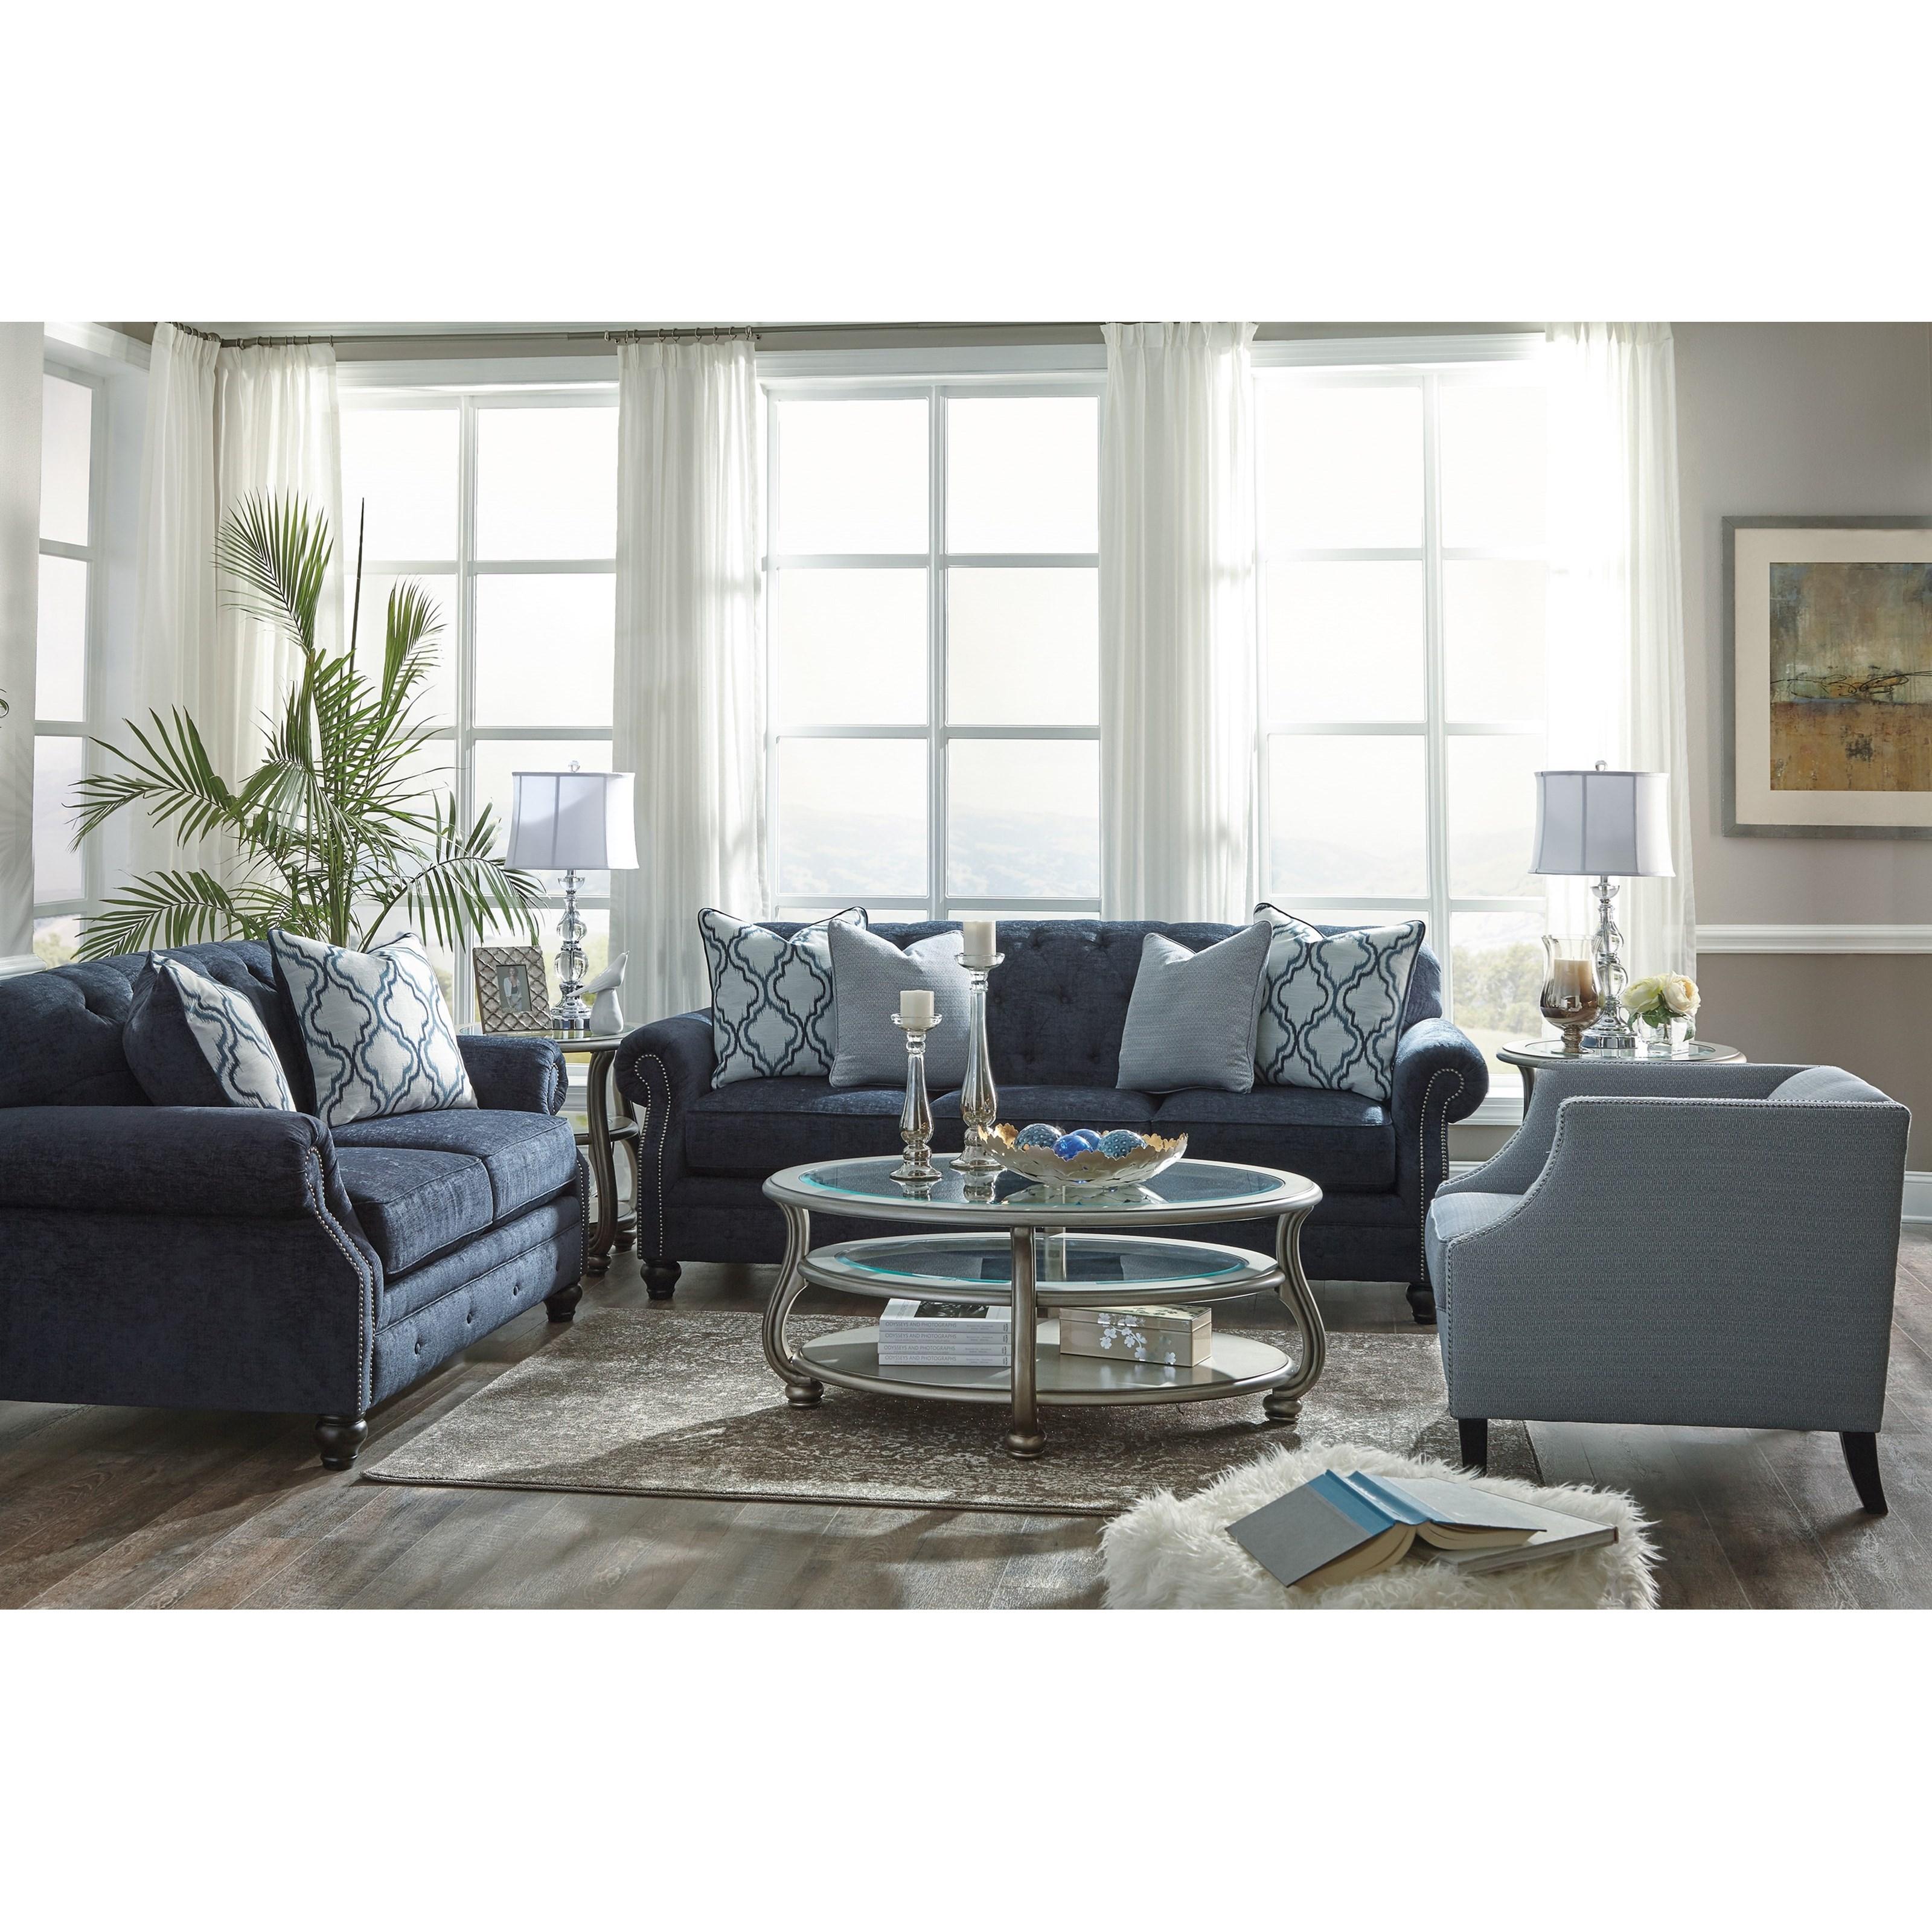 Benchcraft Lavernia Stationary Living Room Group Zak 39 S Fine Furniture Stationary Living Room